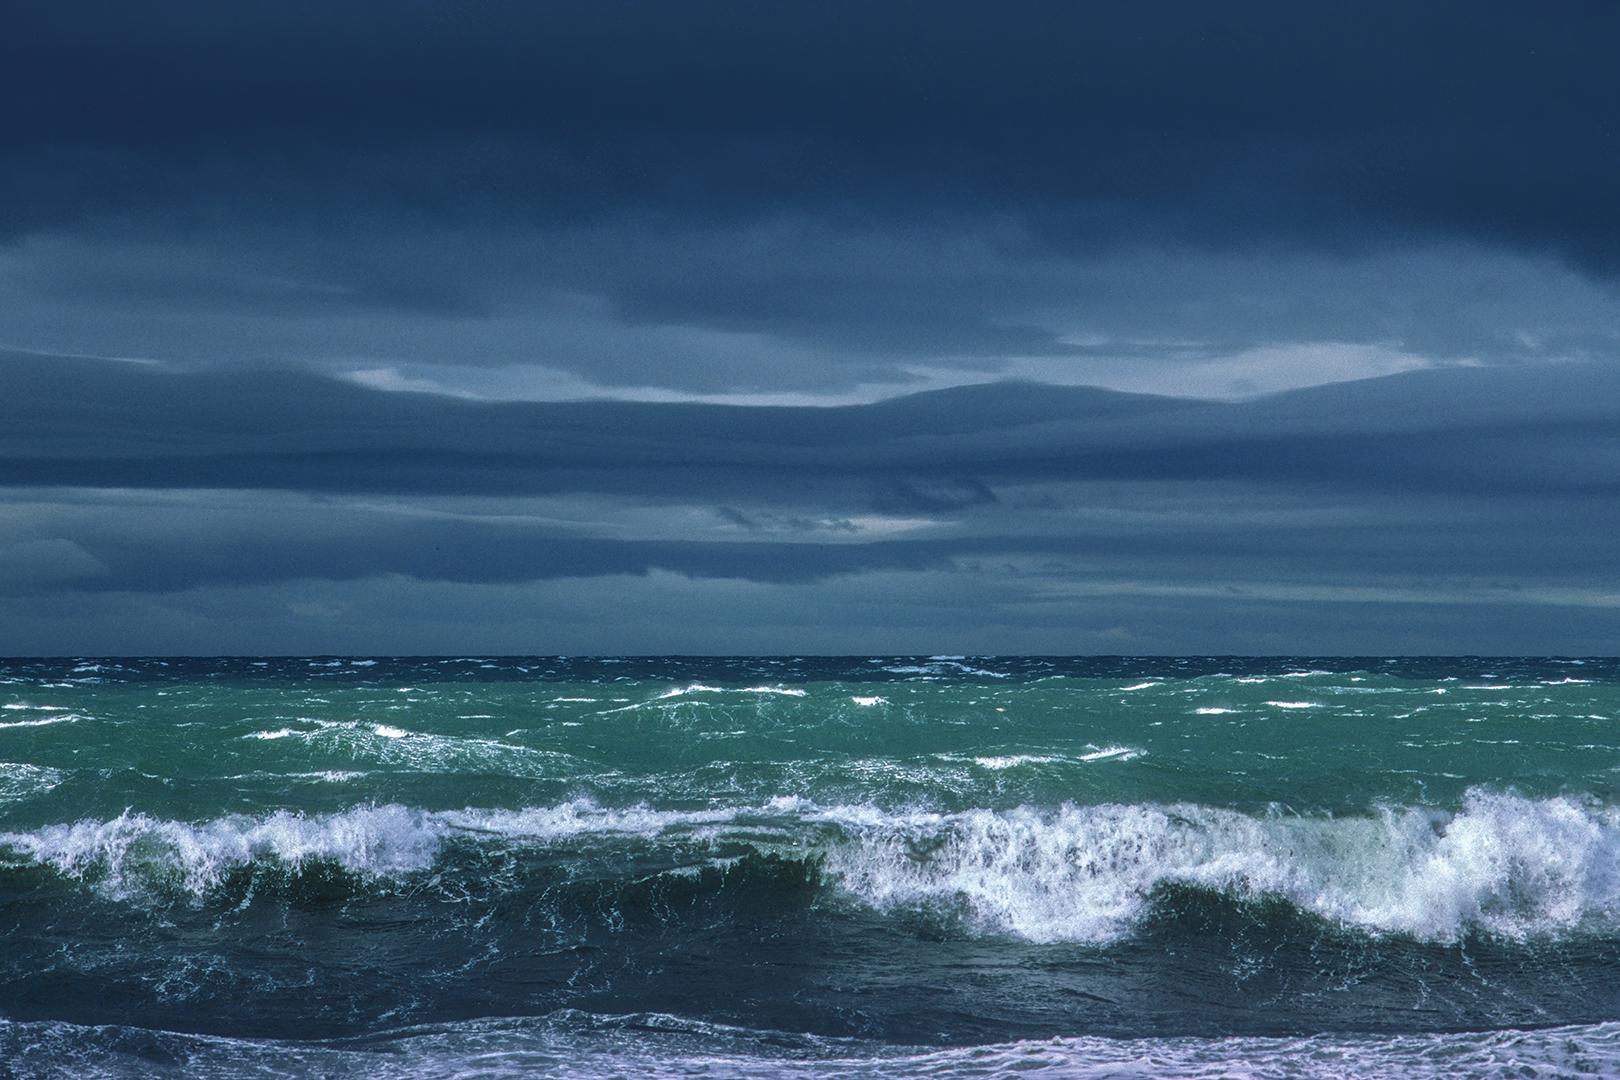 88_191-20 Oceaan B_DeNoise_1620